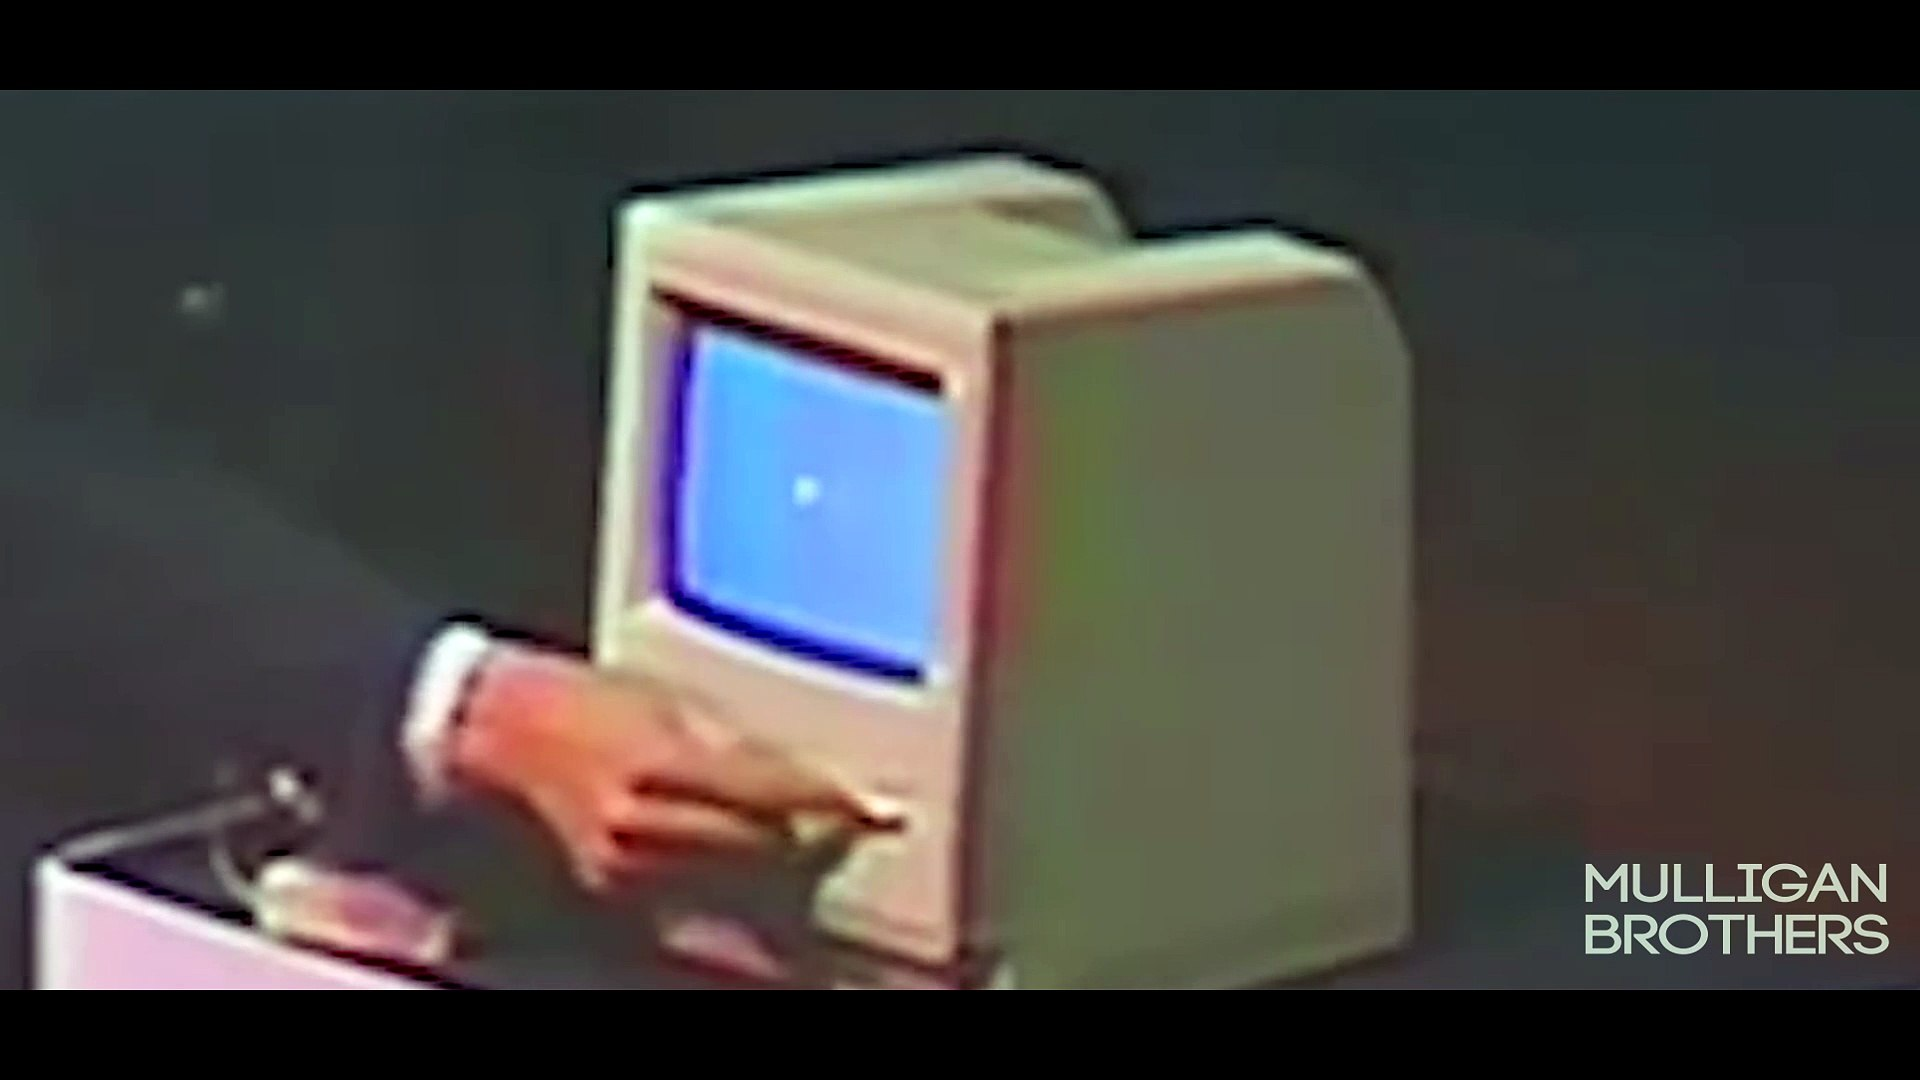 STEVE JOBS - MOTIVATIONAL VIDEO